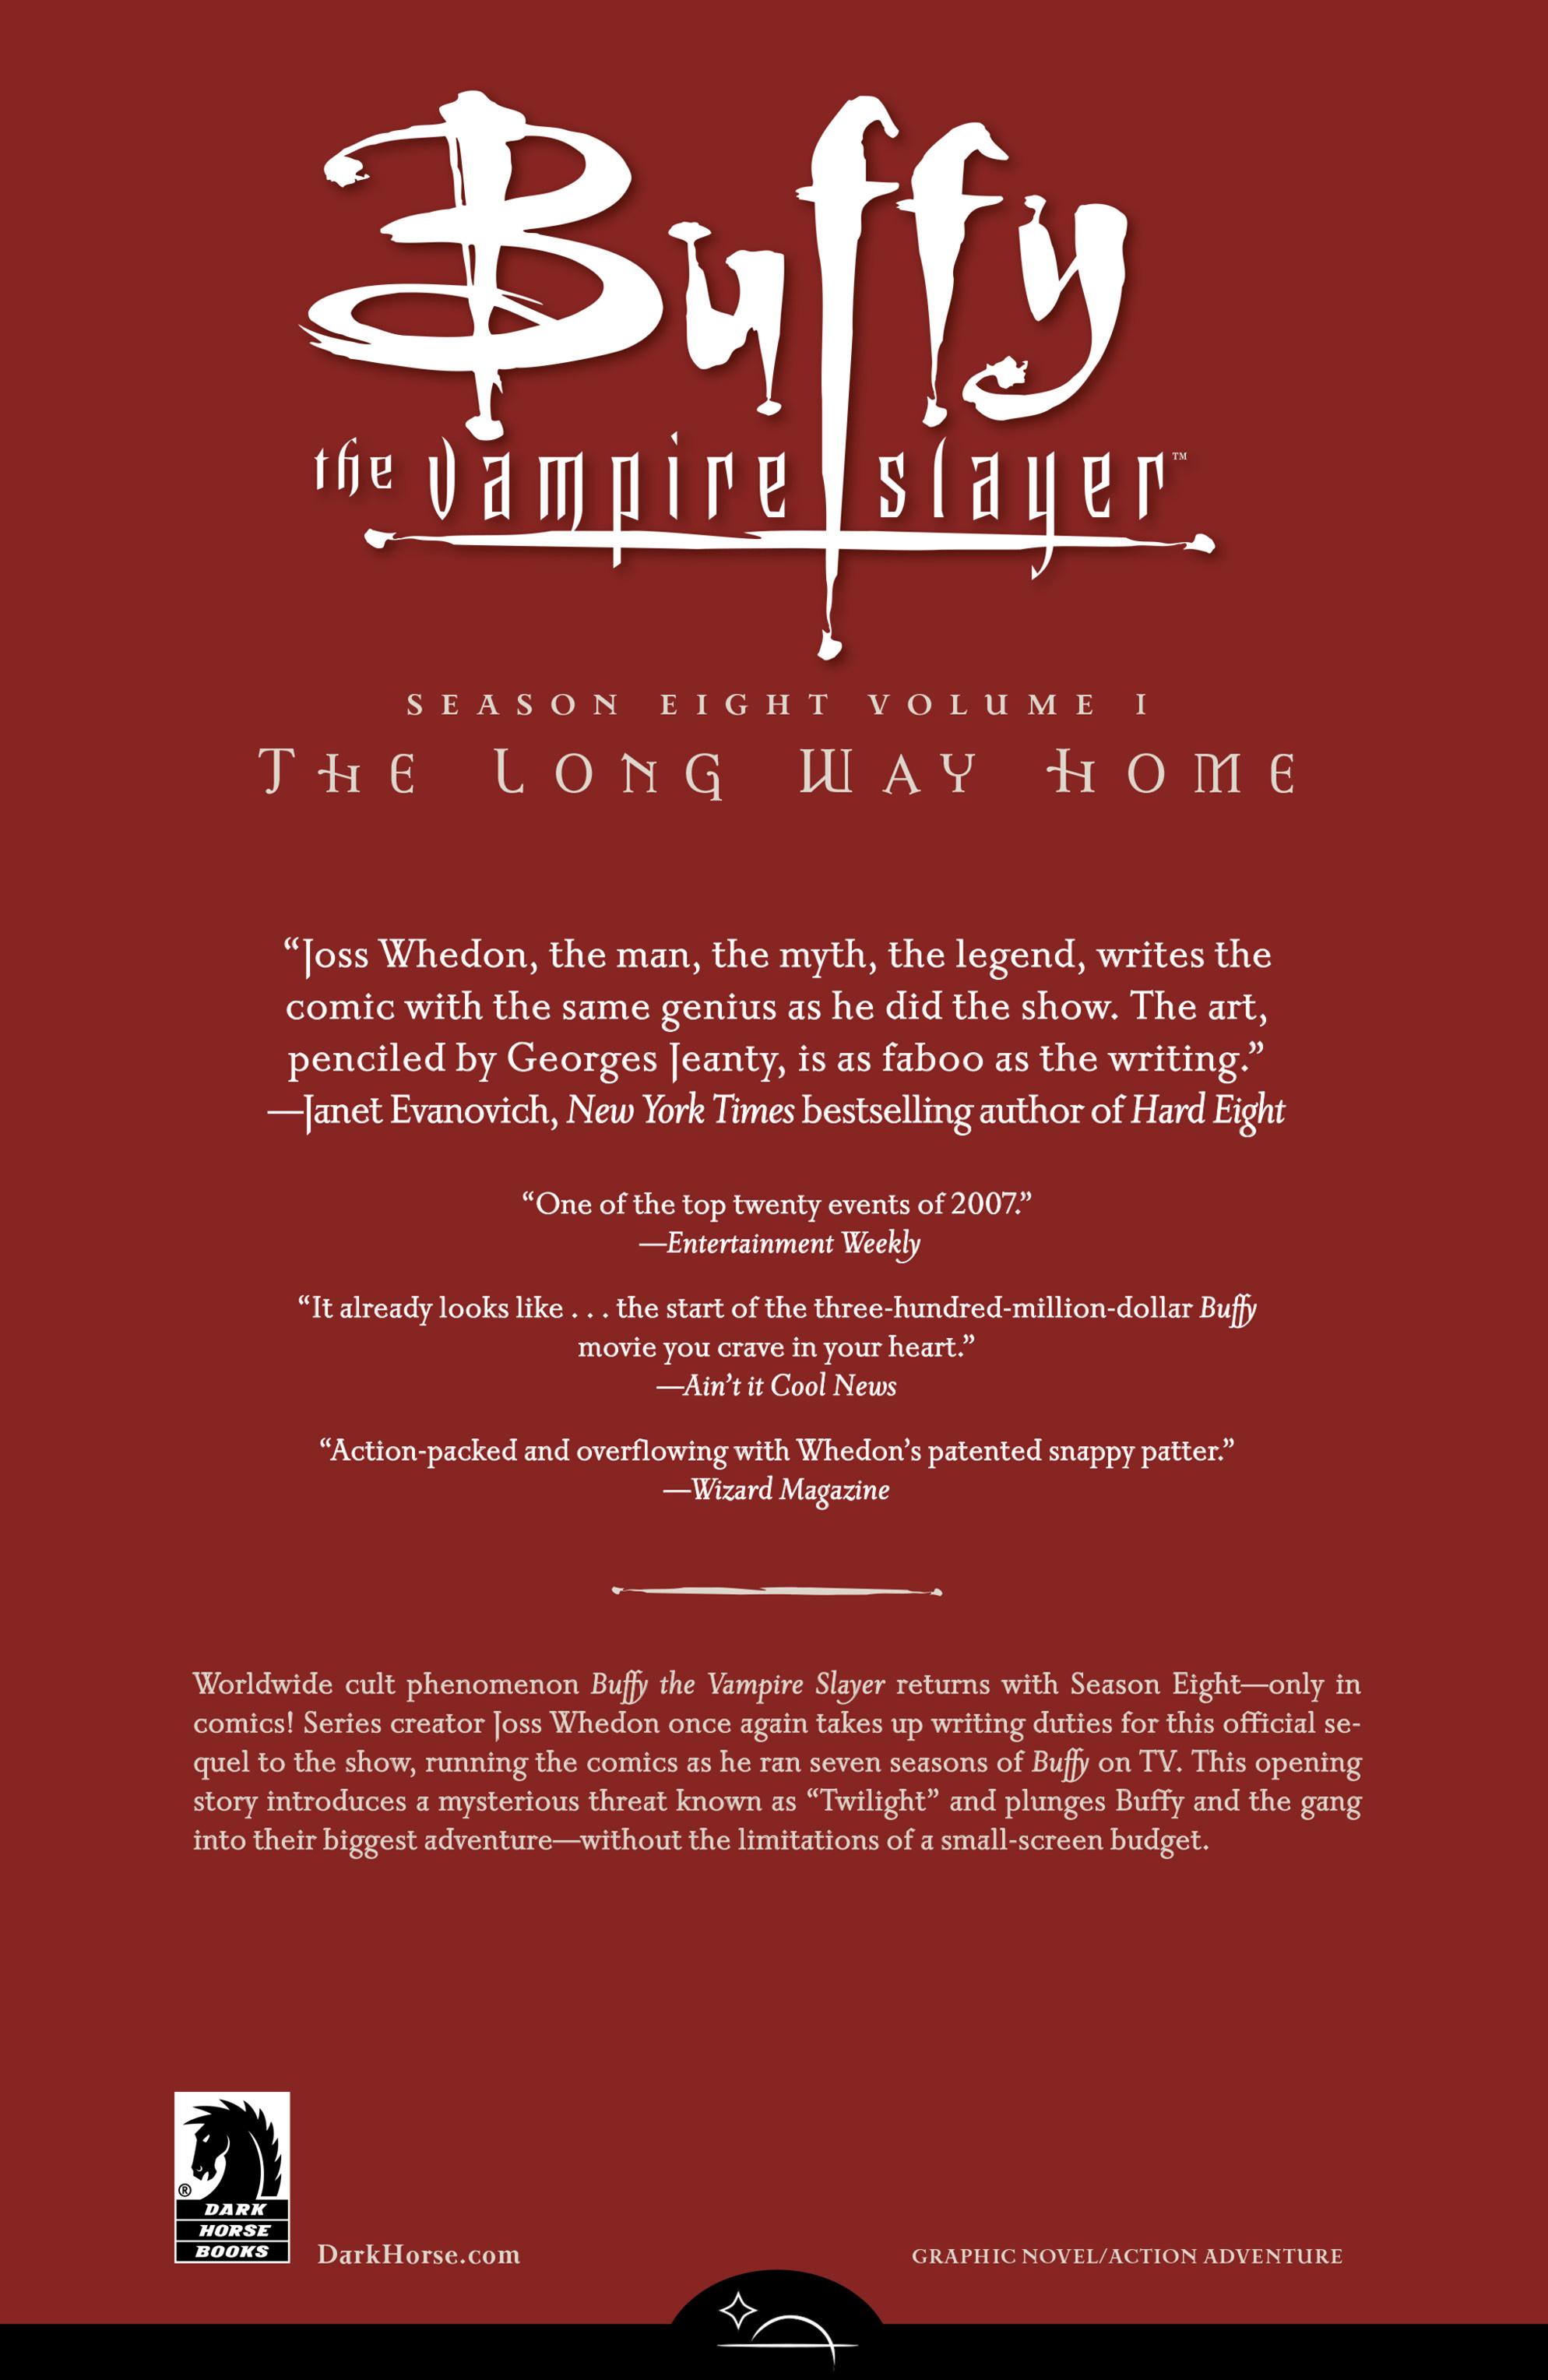 Buffy the Vampire Slayer Season Eight _TPB_1_-_The_Long_Way_Home Page 128